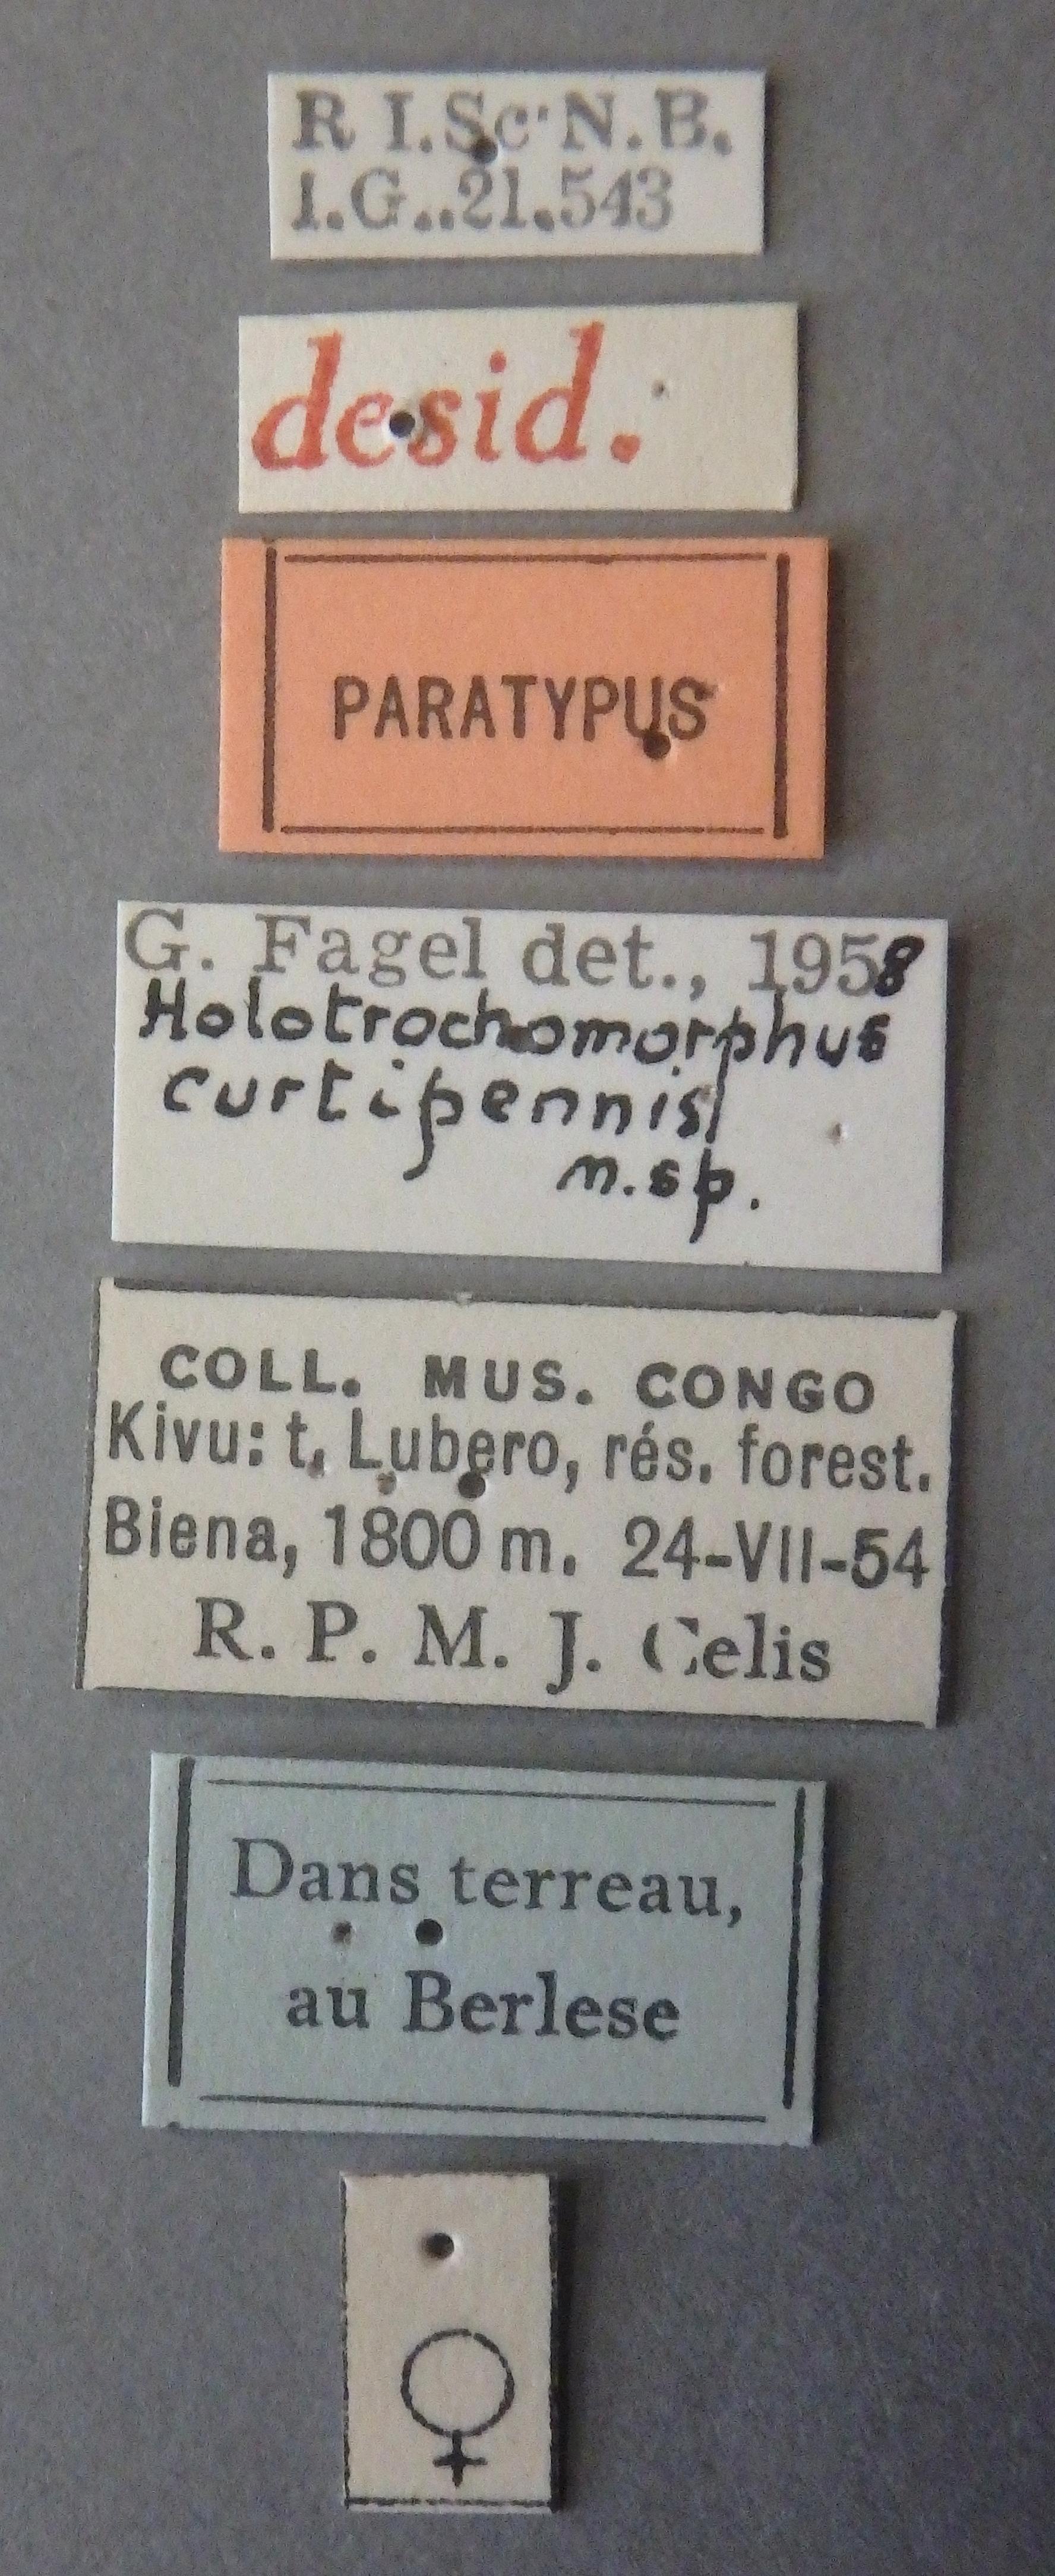 Holotrochomorphus curtipennis pt Lb.JPG